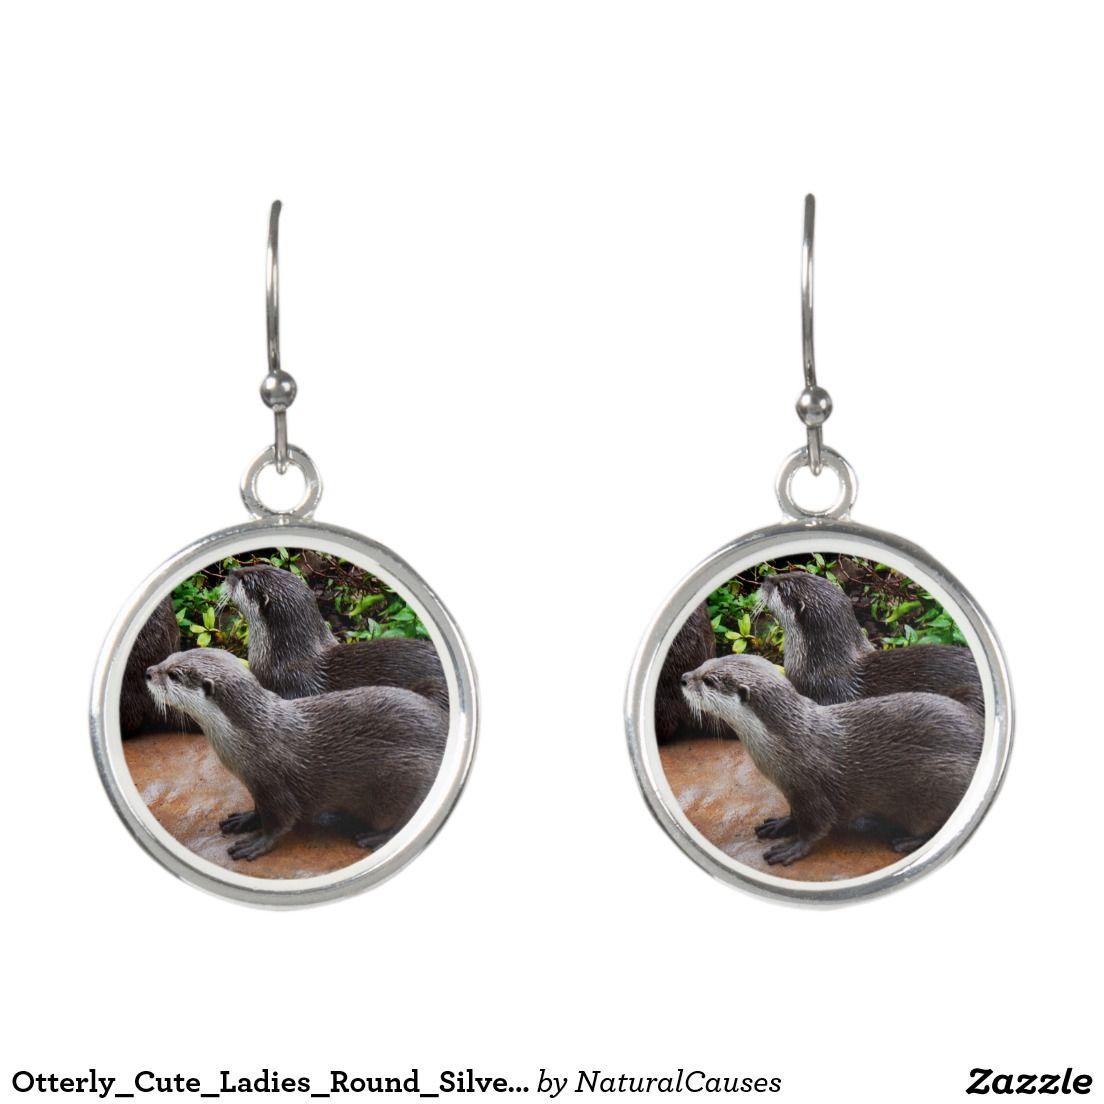 Otterly_Cute_Ladies_Round_Silver_Otter_Earrings. Earrings